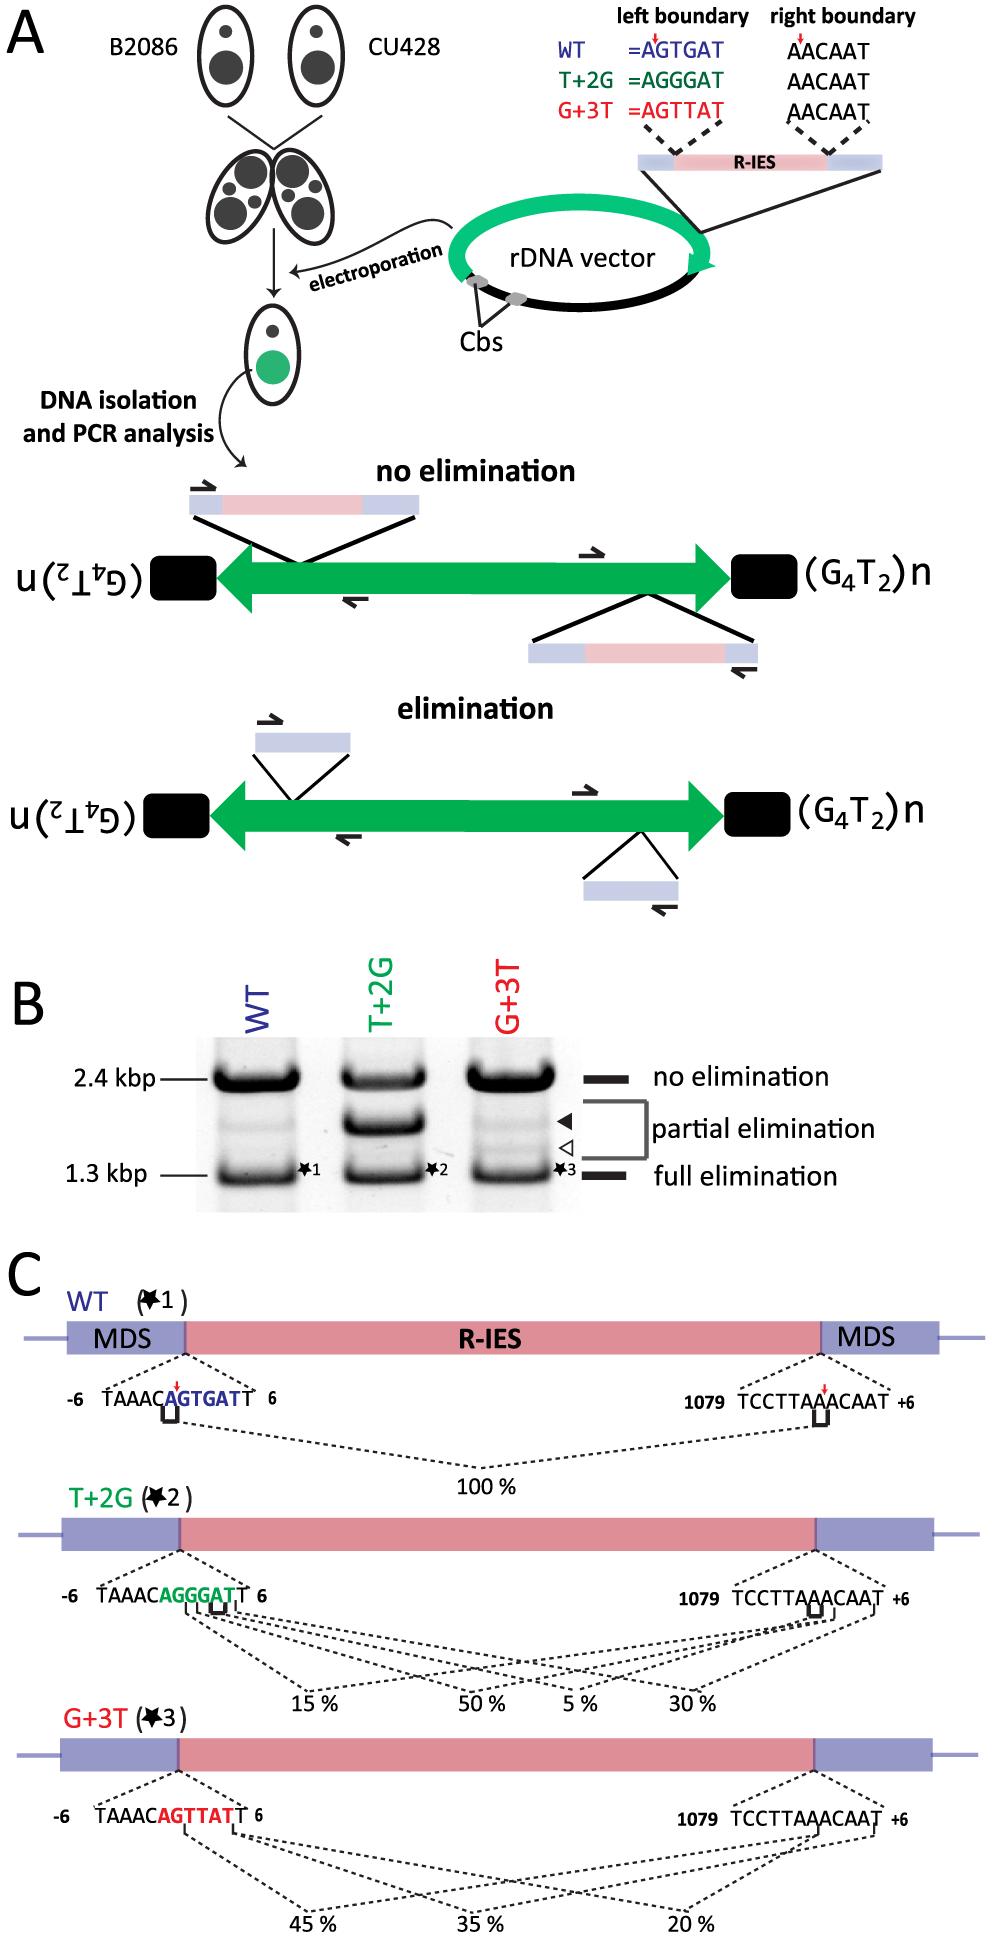 In vivo elimination assay using mutated R-IES boundaries.